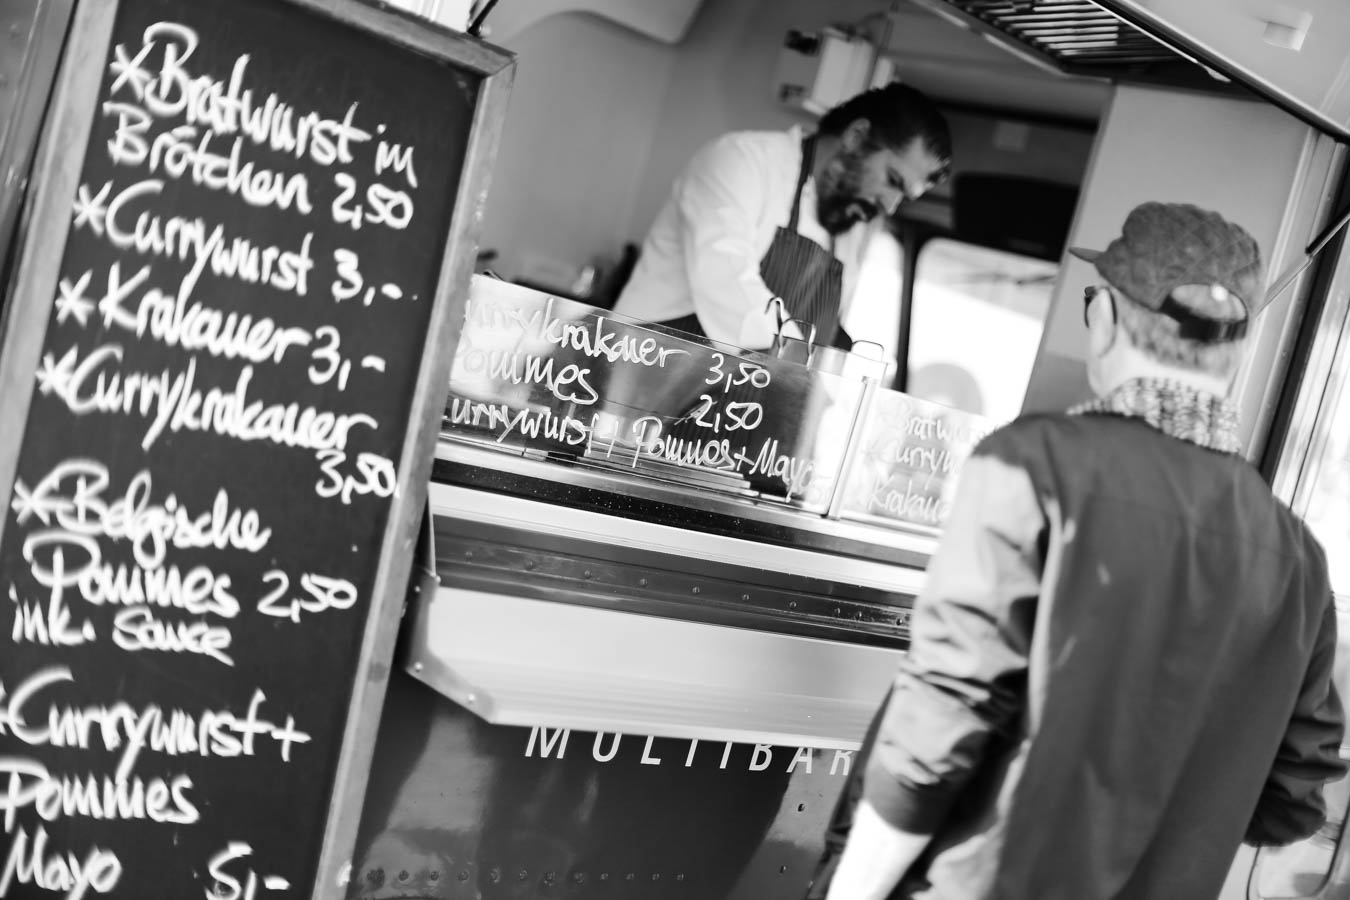 Sunday Up Market Köln - Food Trucks